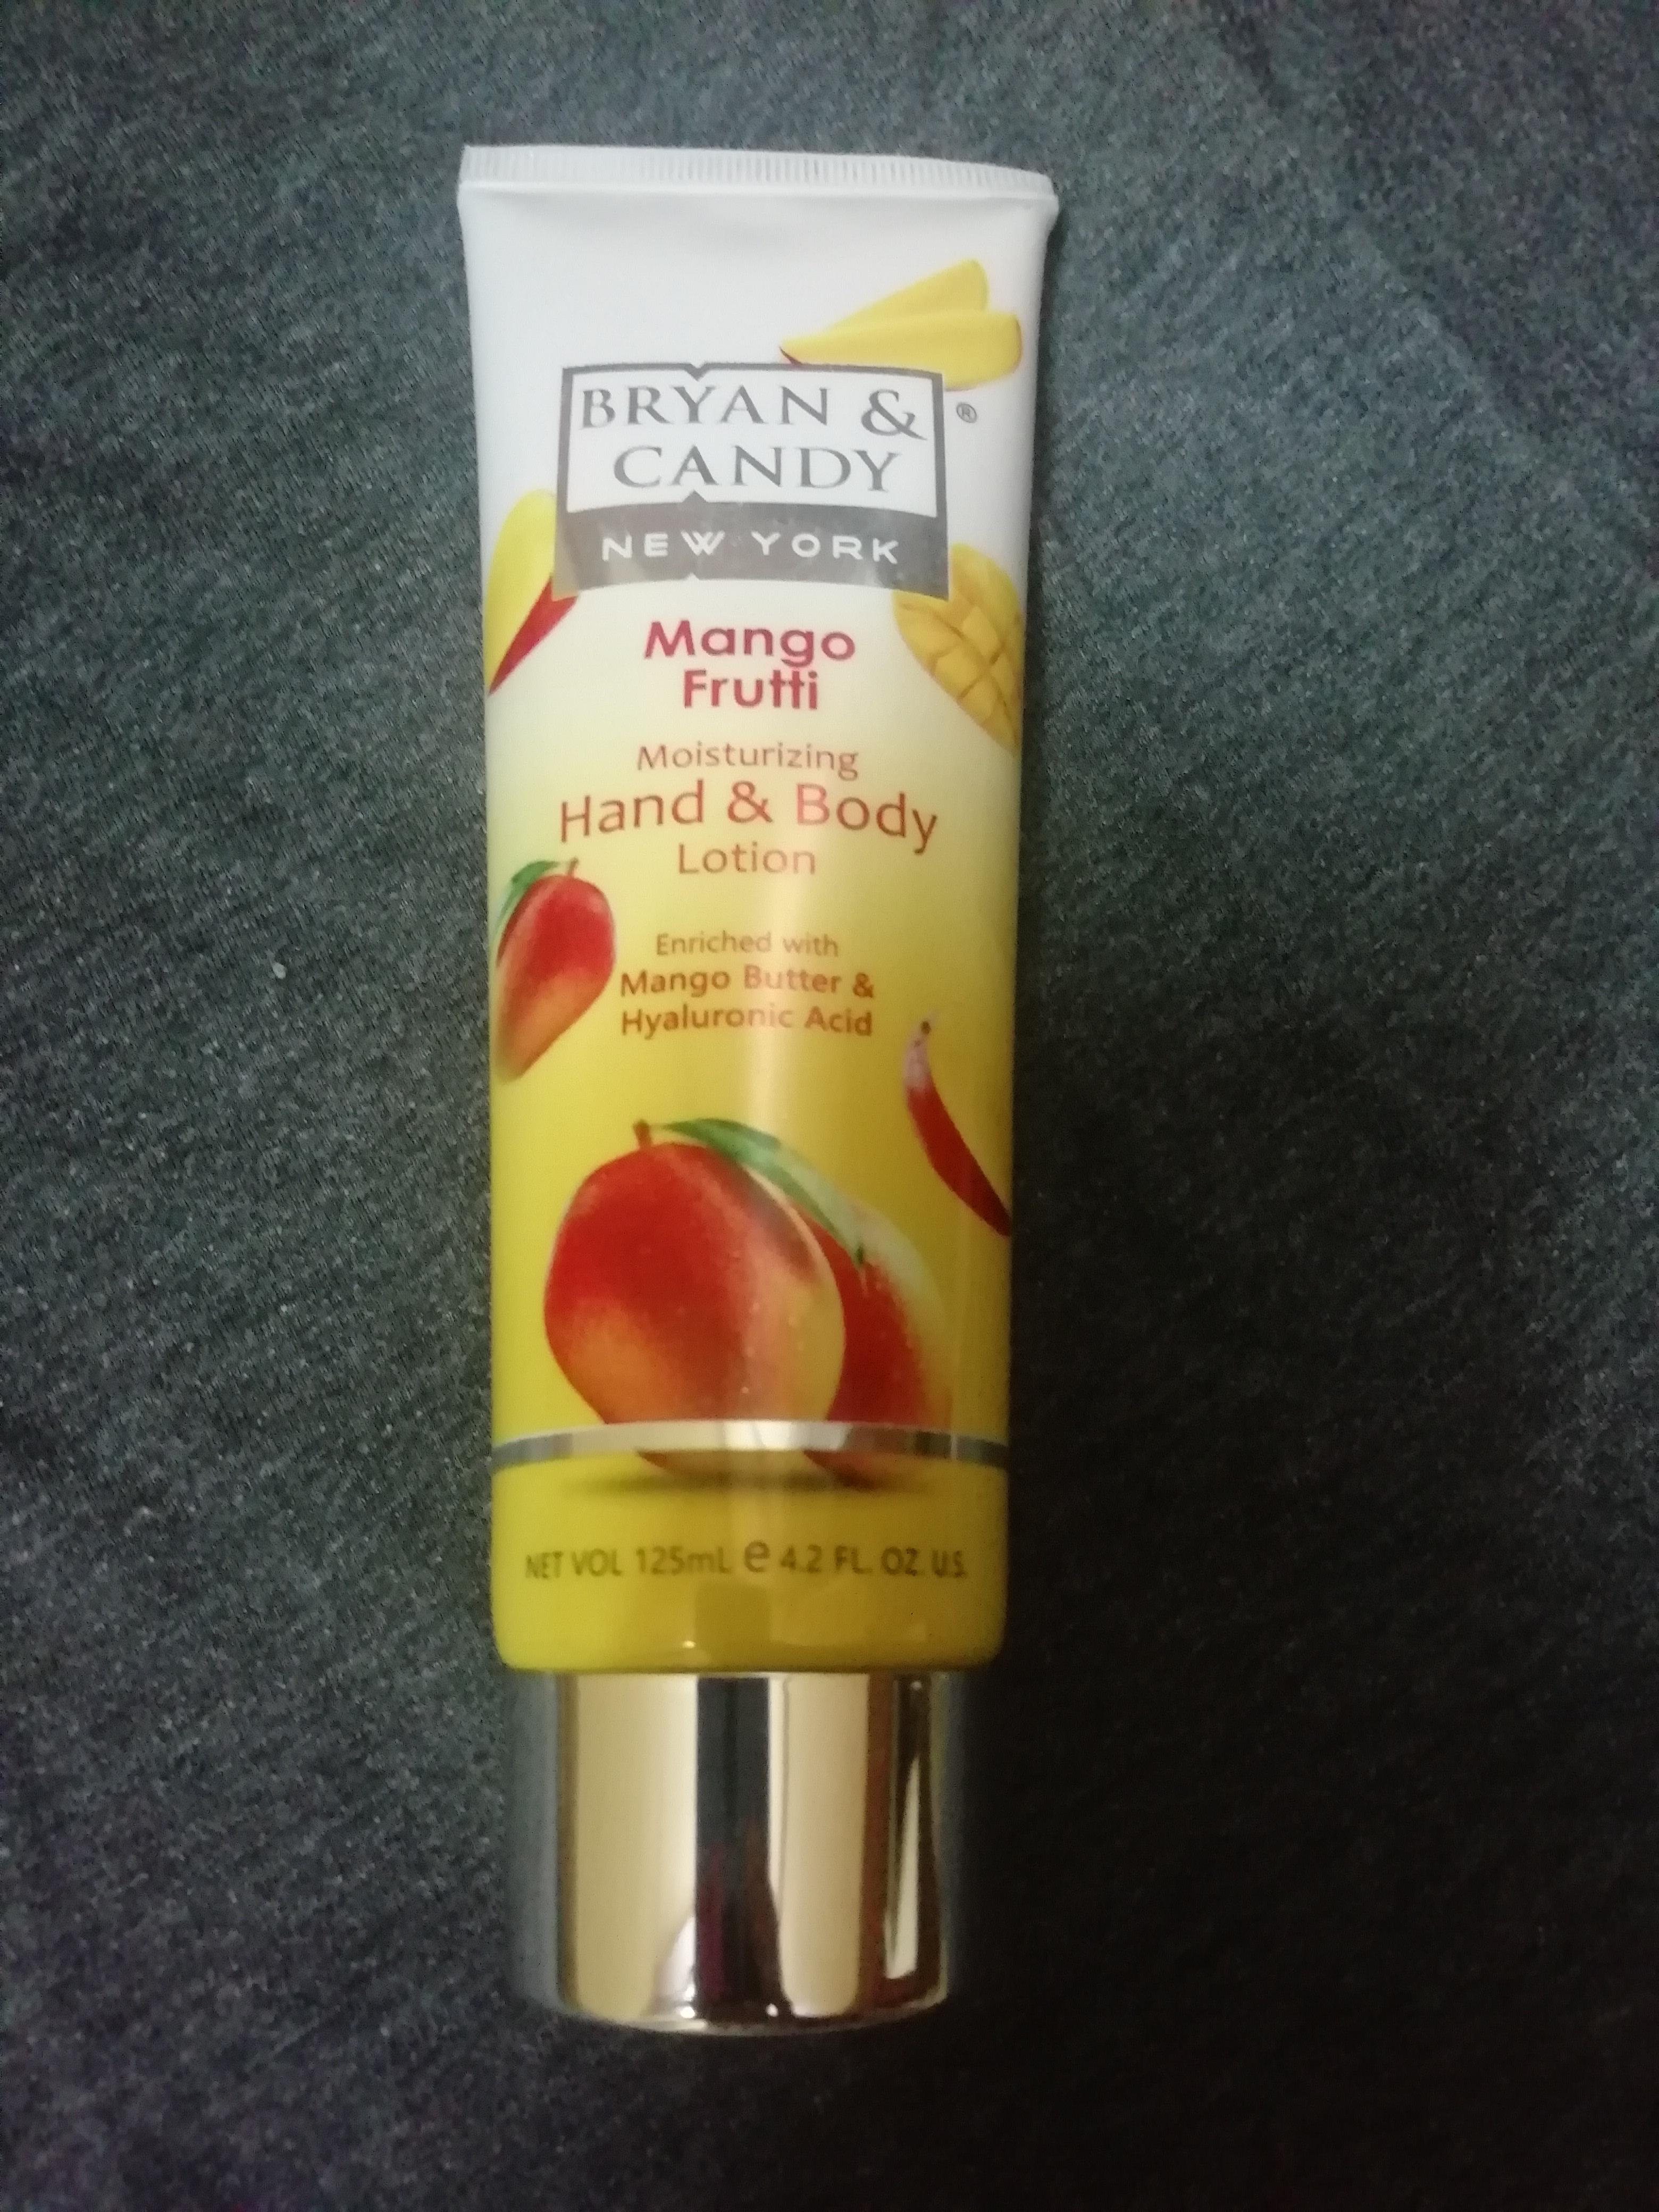 Bryan & Candy New York Mango Frutti Hand and Body Lotion -Mango hand and body lotion-By meha